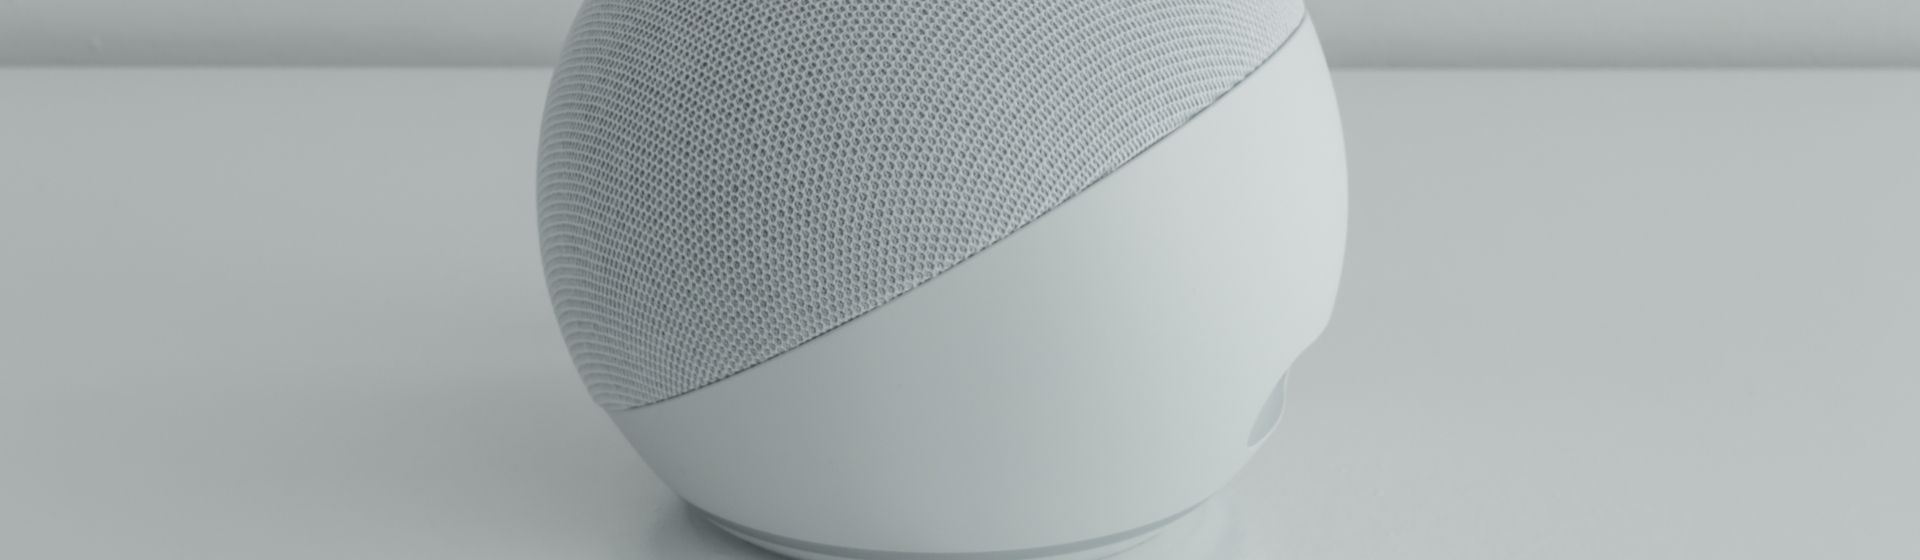 Echo Dot 4 vale a pena? Confira a análise de ficha técnica